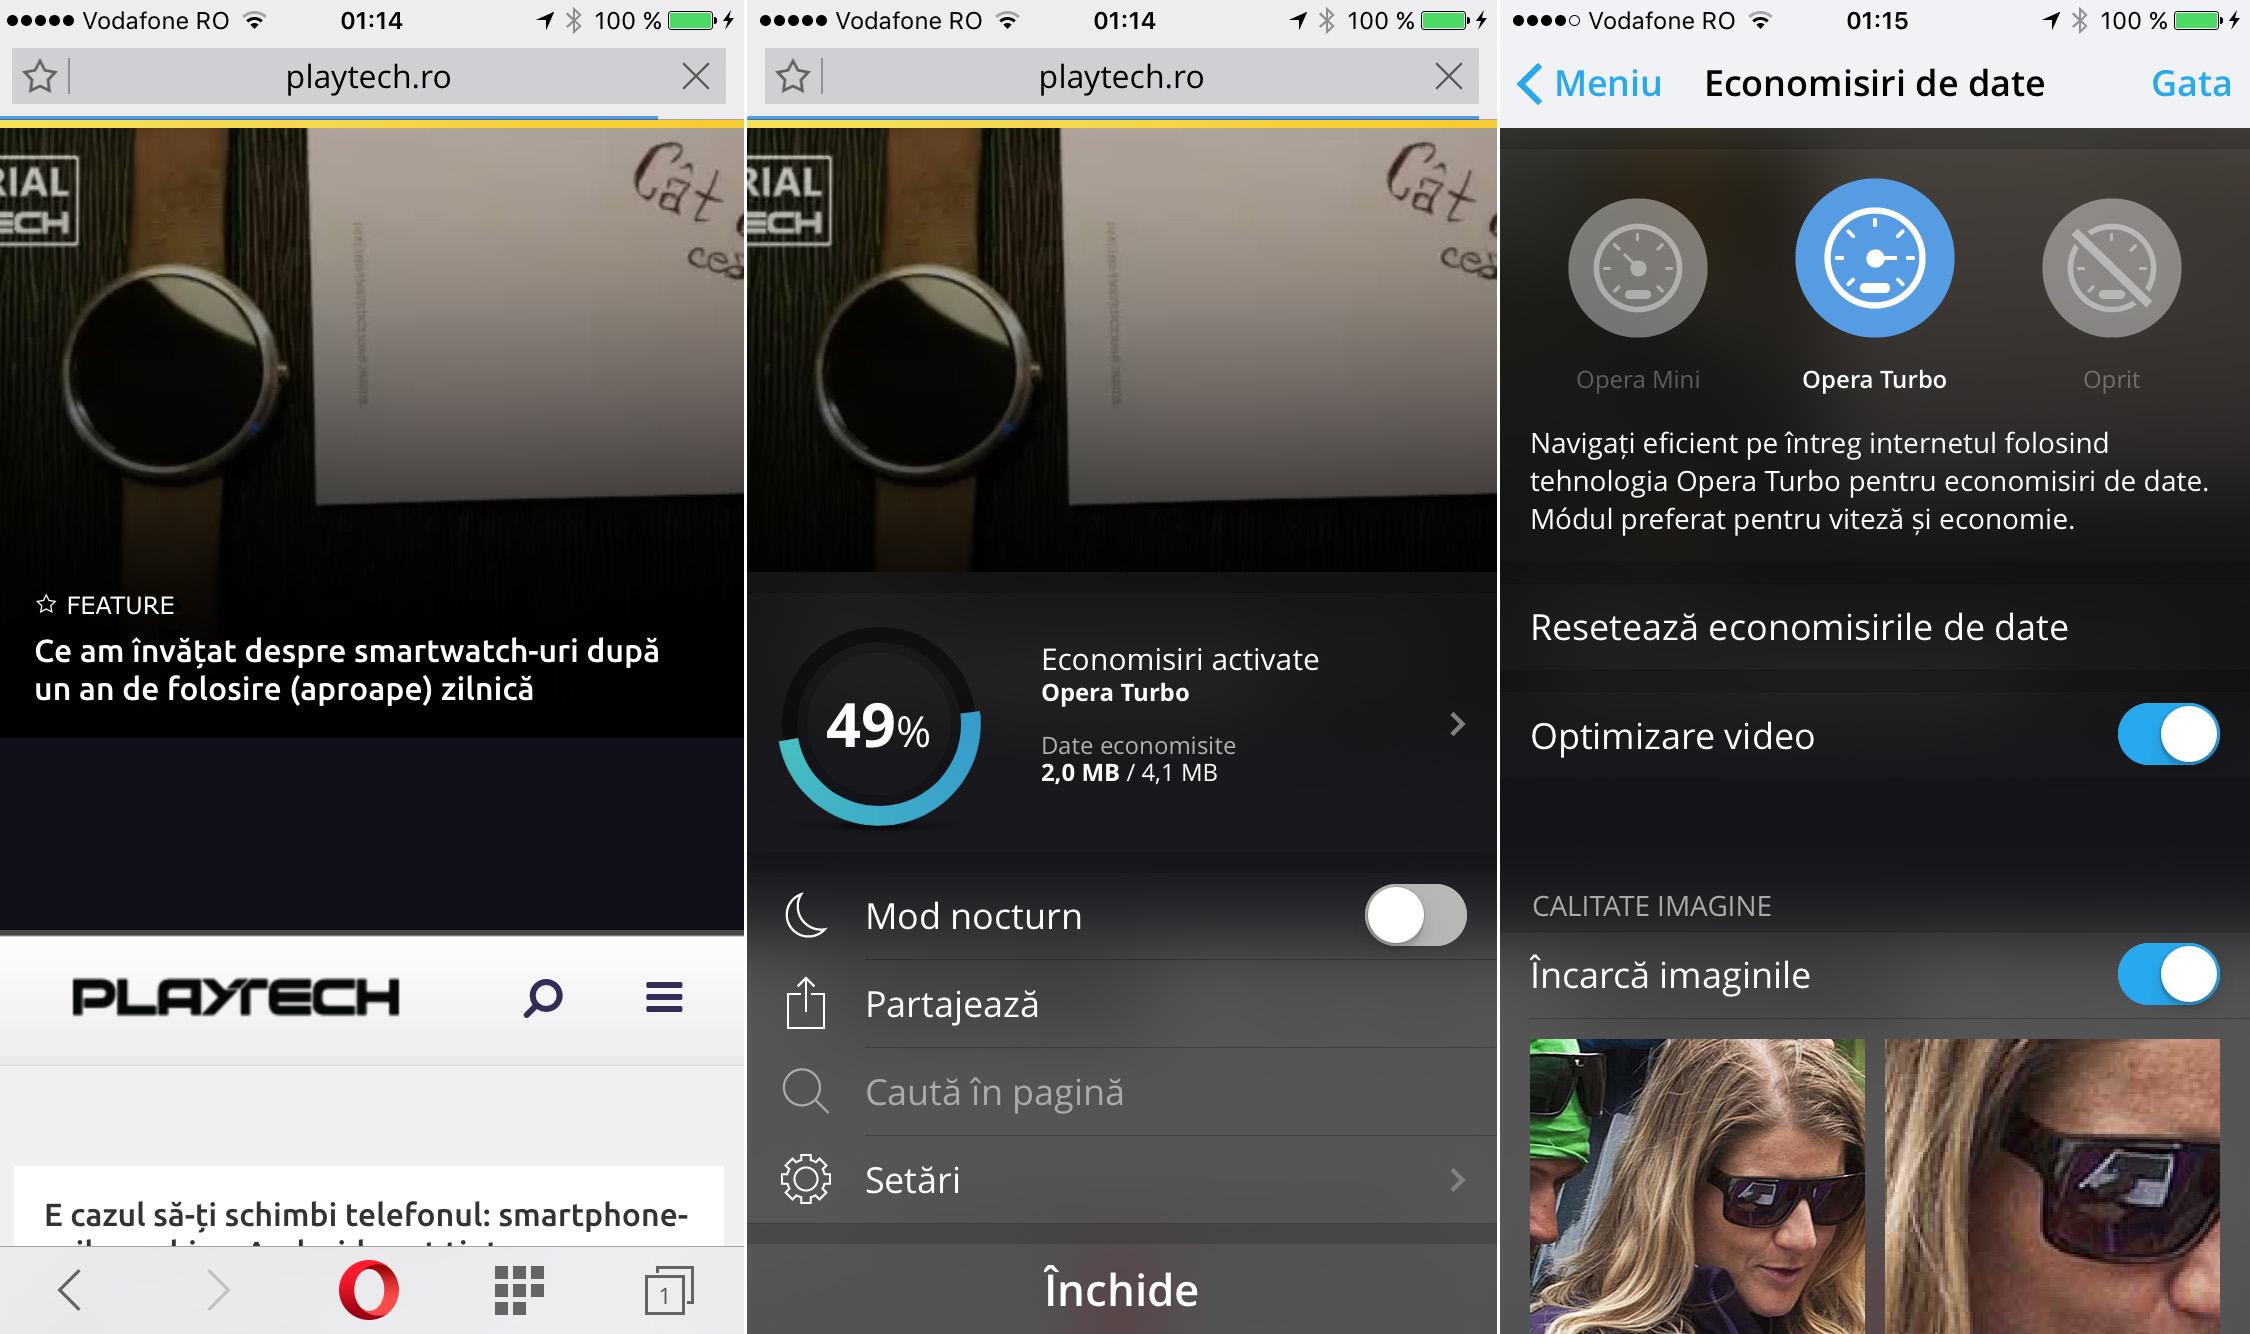 iPhone date celulare pe iPhone compresie browser Opera